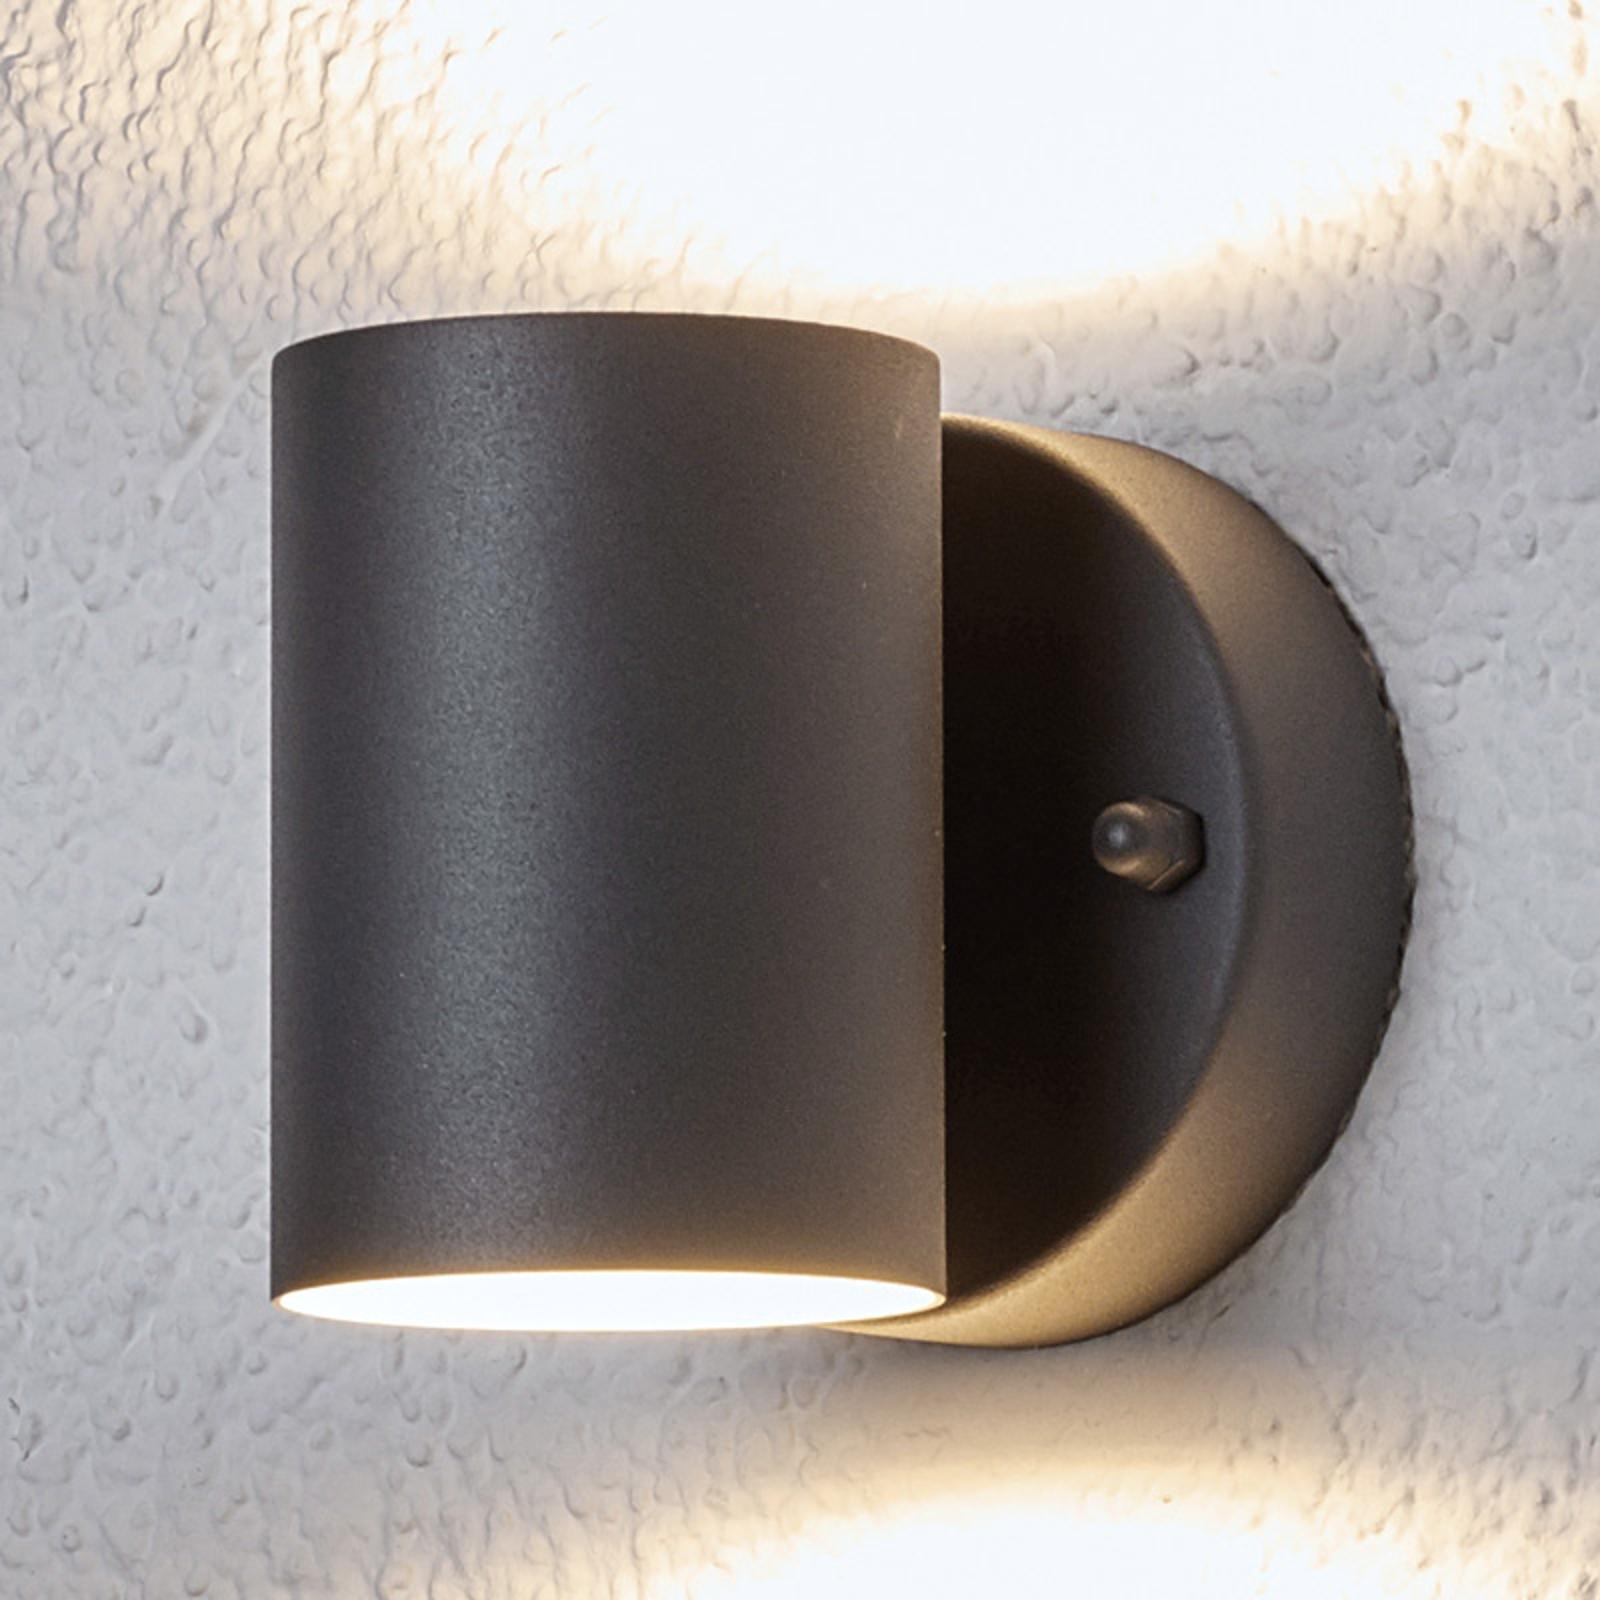 Lexi - LED-utomhusvägglampa, 2 ljuskällor